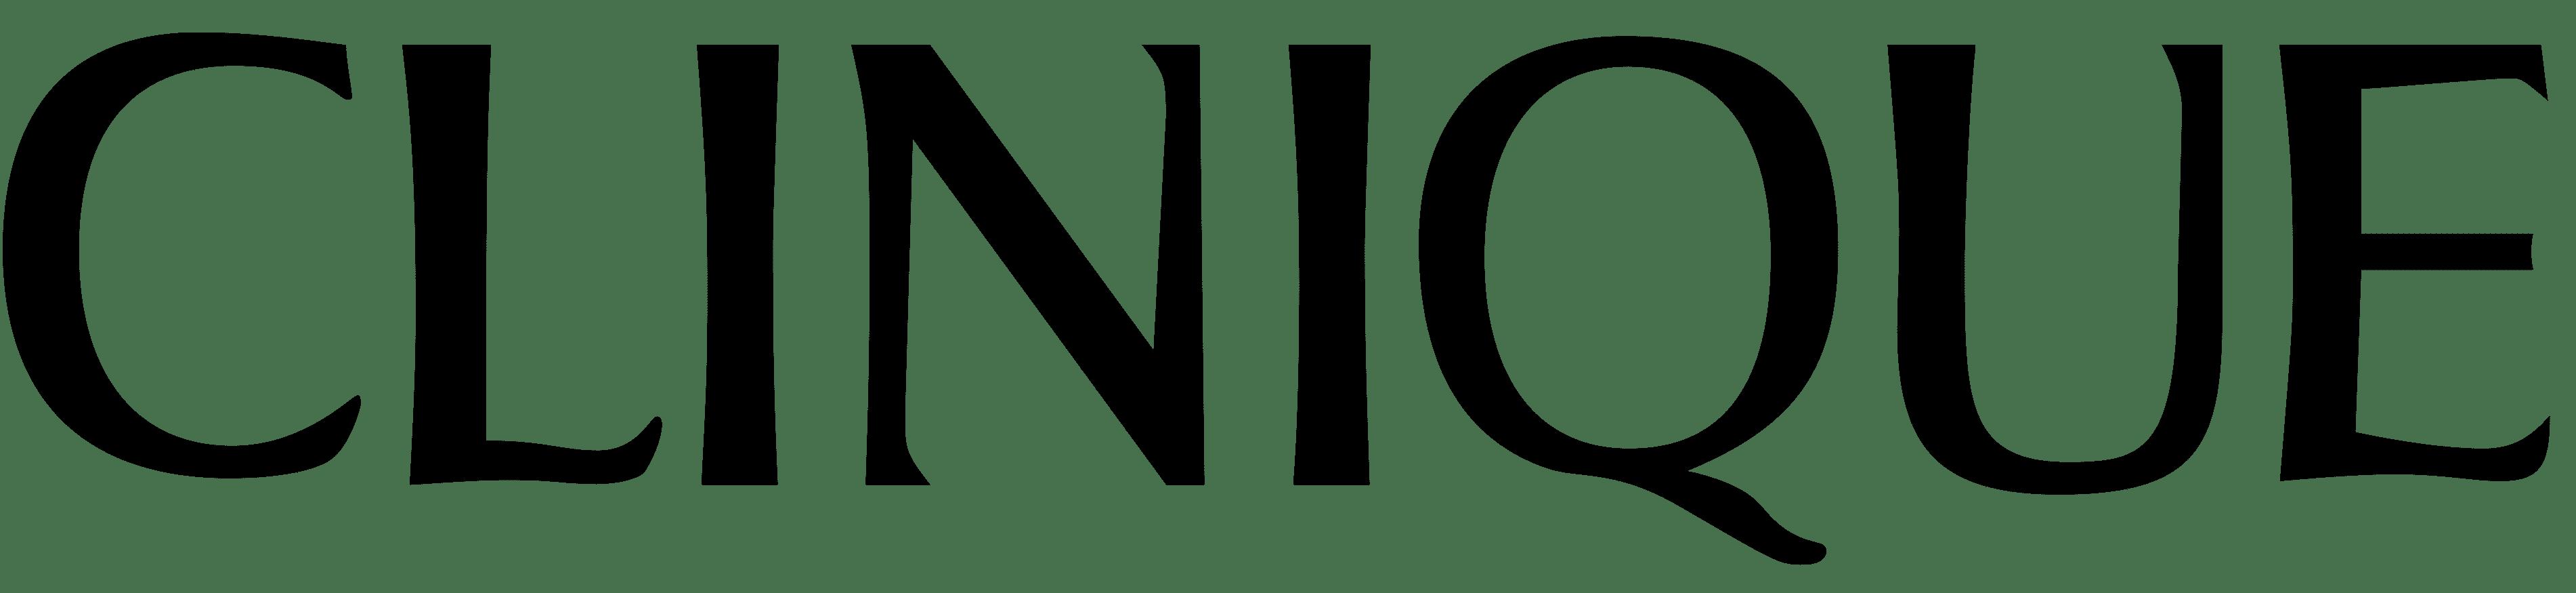 clinique logo for sponsorship